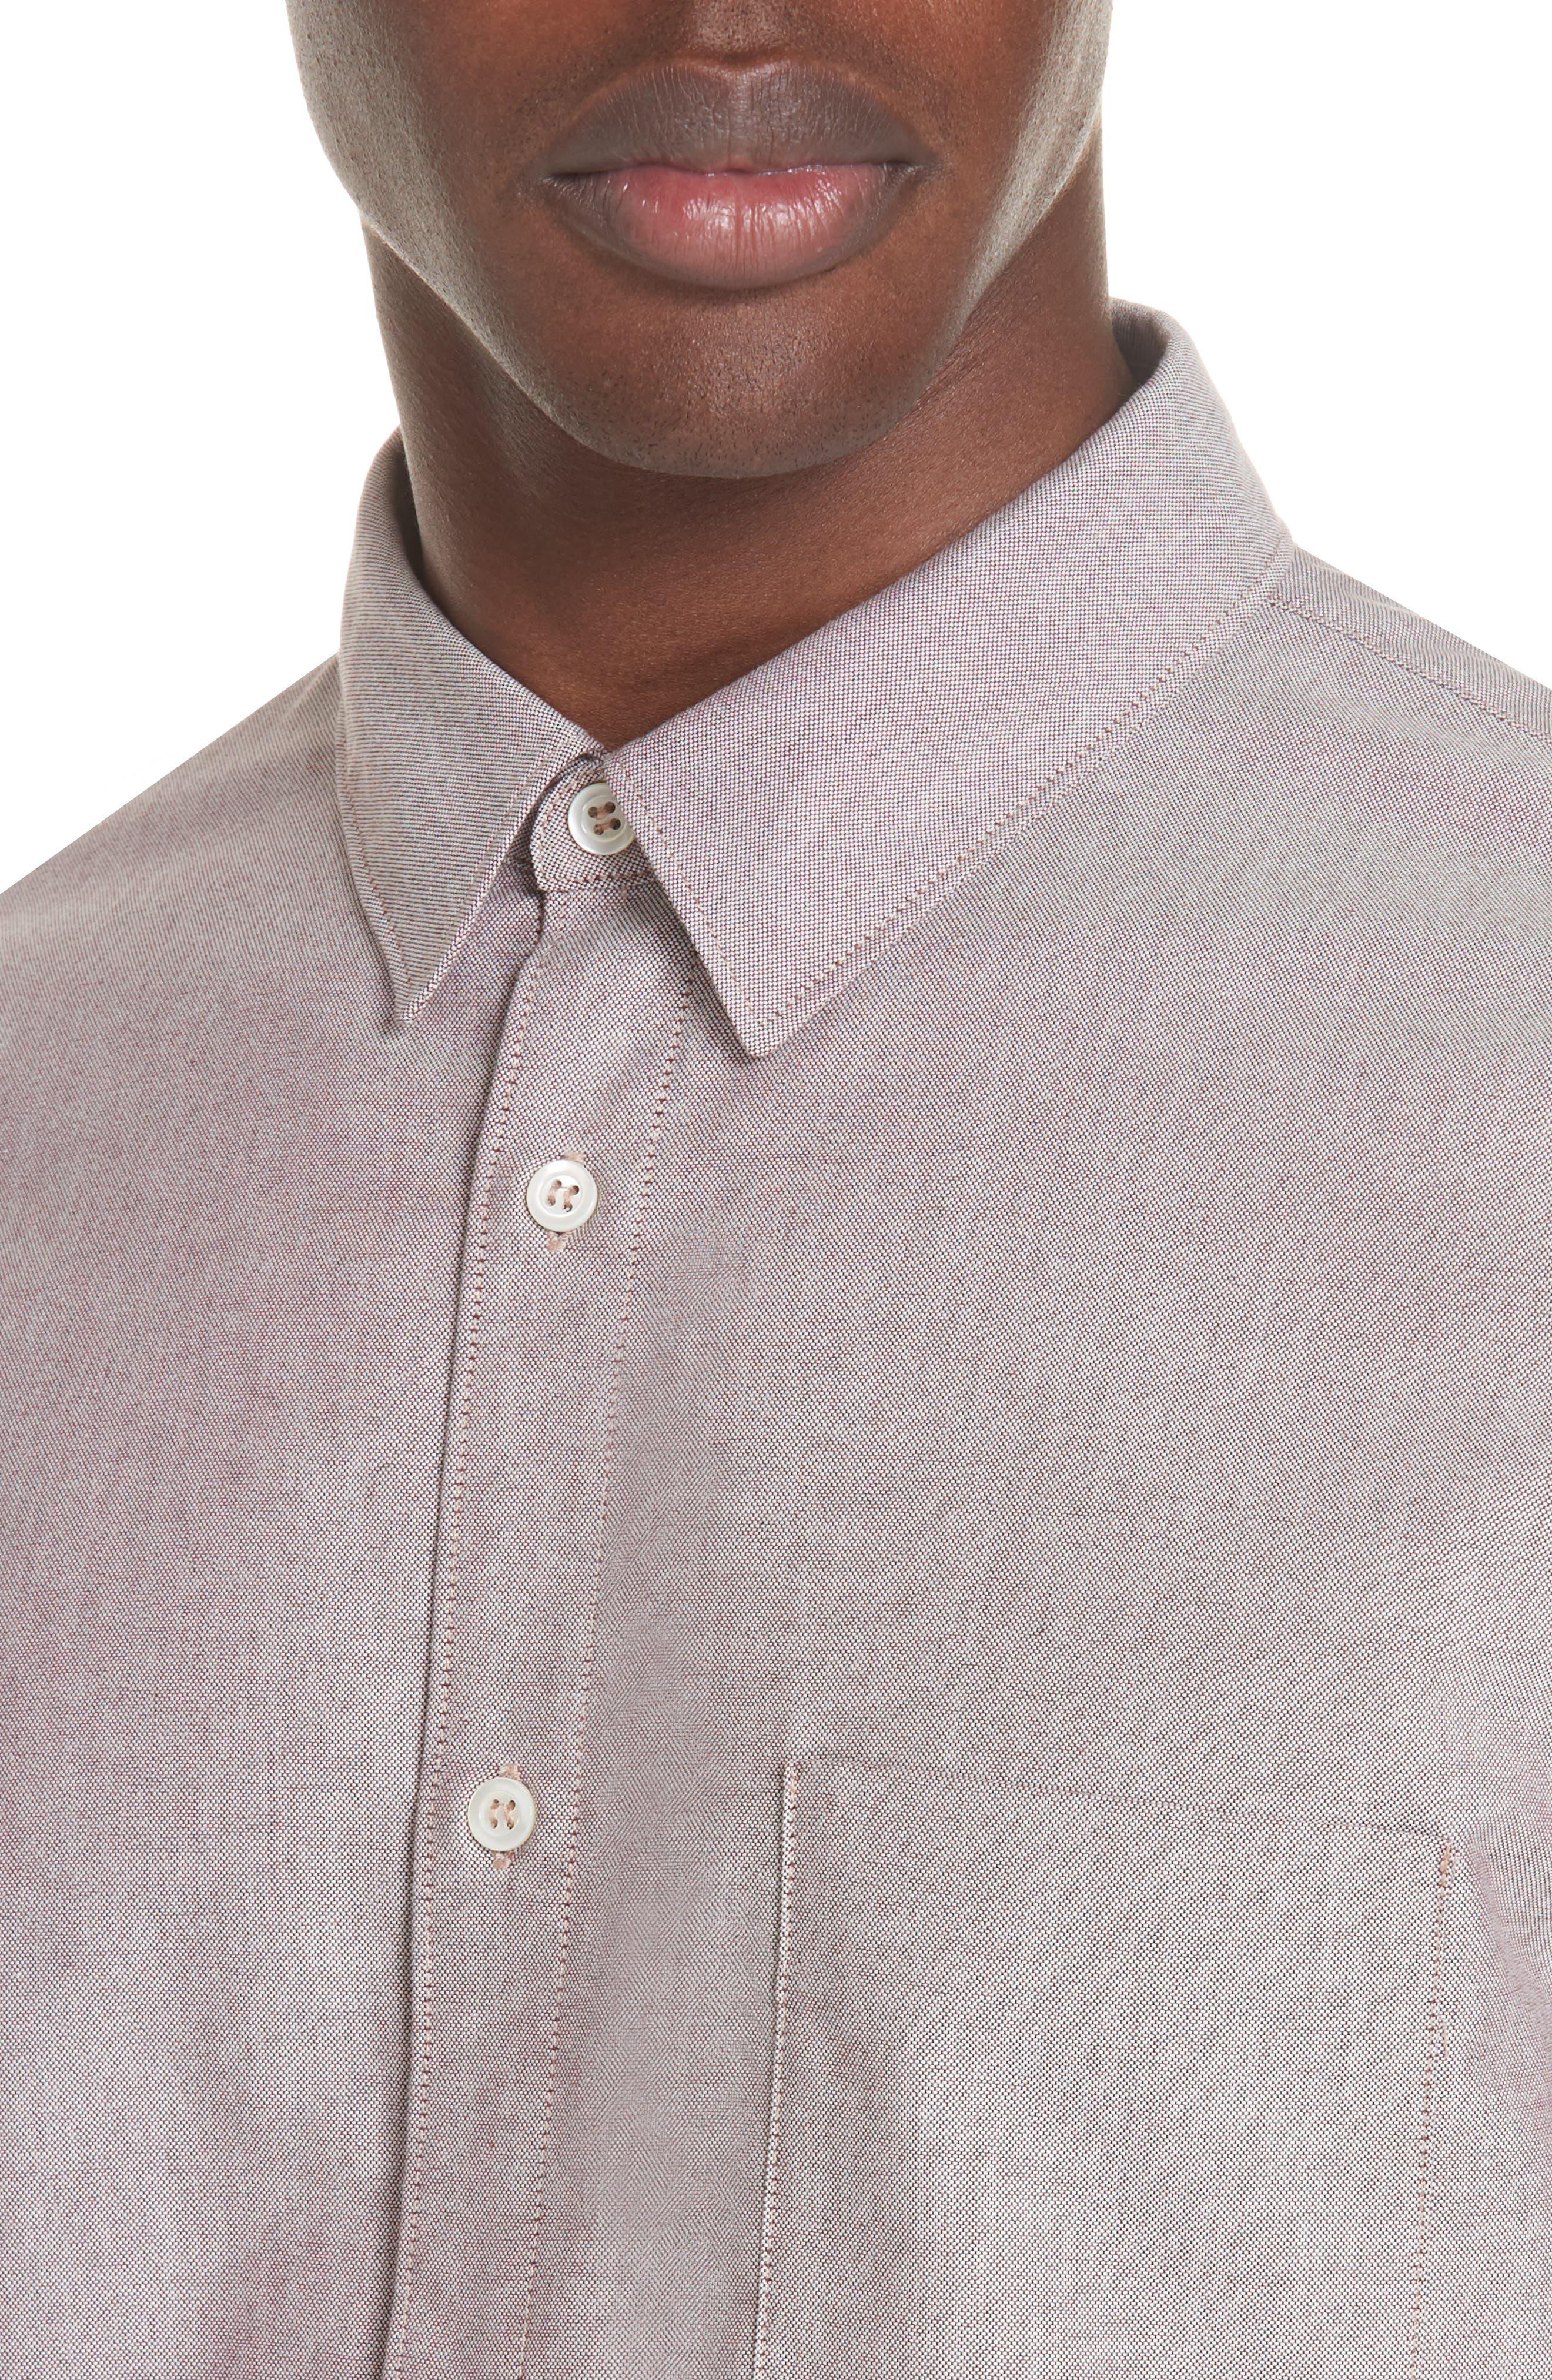 Oxford Sport Shirt,                             Alternate thumbnail 2, color,                             GAC BORDE